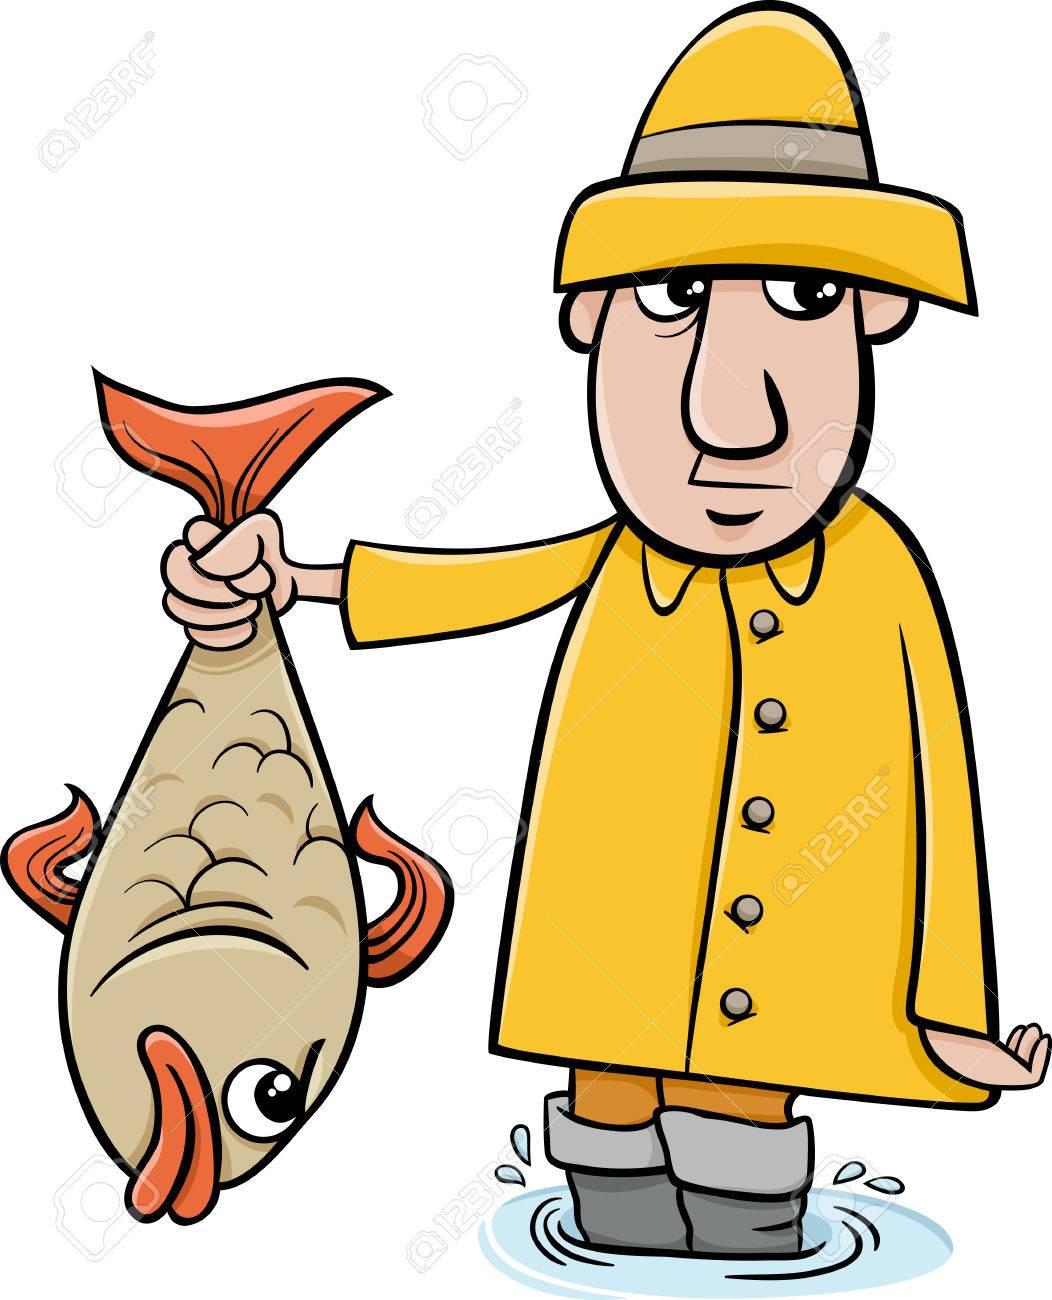 Cartoon Illustration of Angler or Fisherman with Big Fish.